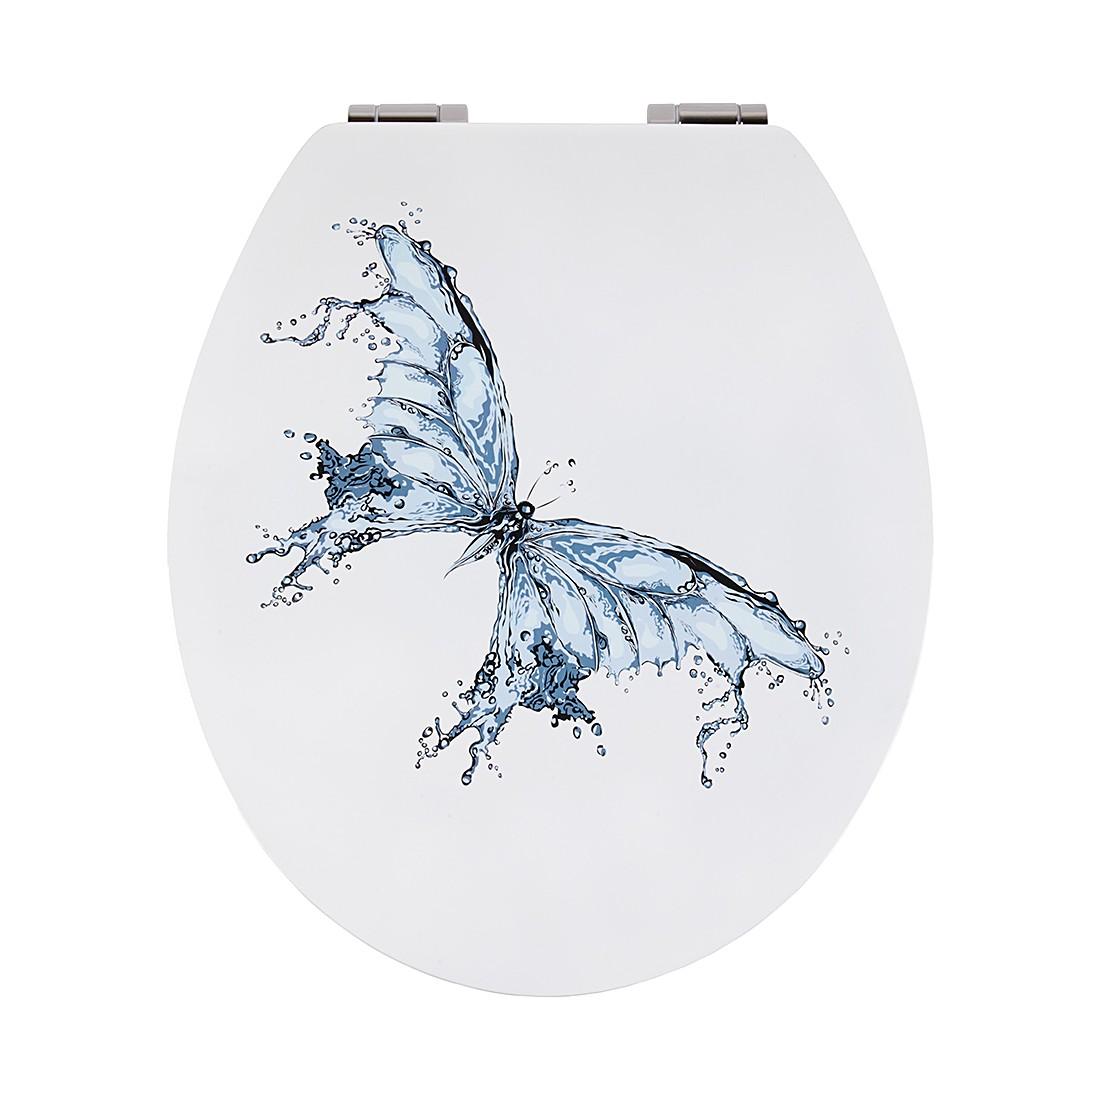 WC-Sitz Papilio - Weiß, mit Absenkautomatik, Sanwood